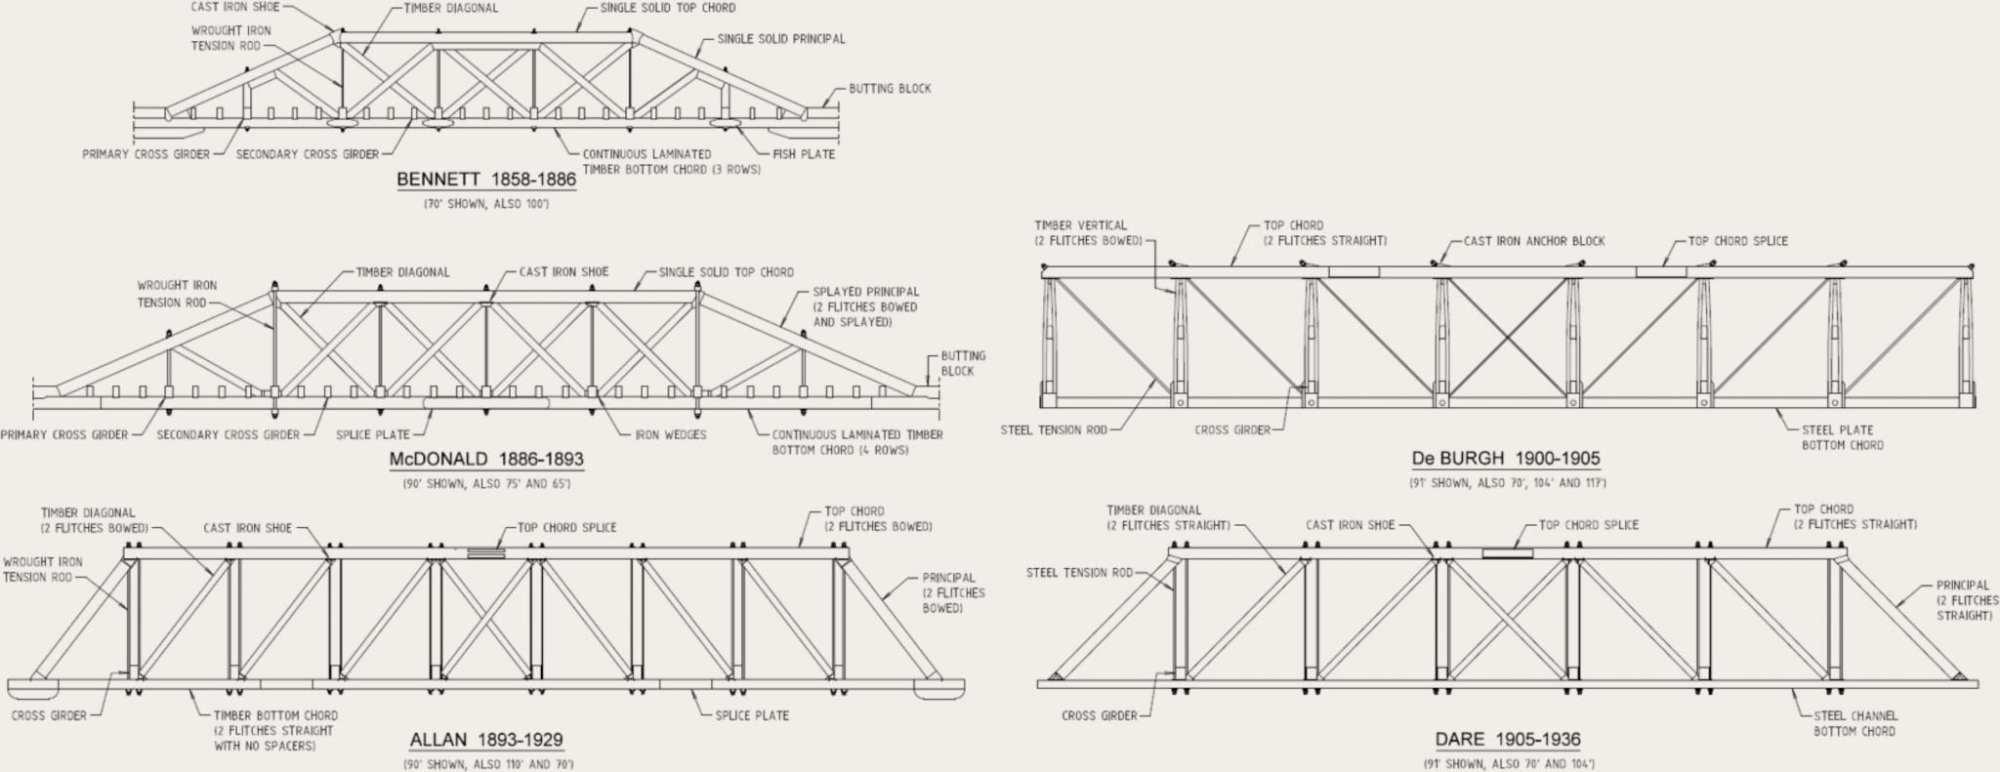 hight resolution of chapter 2 truss book truss bridge diagram displaying 19 images for truss bridge diagram